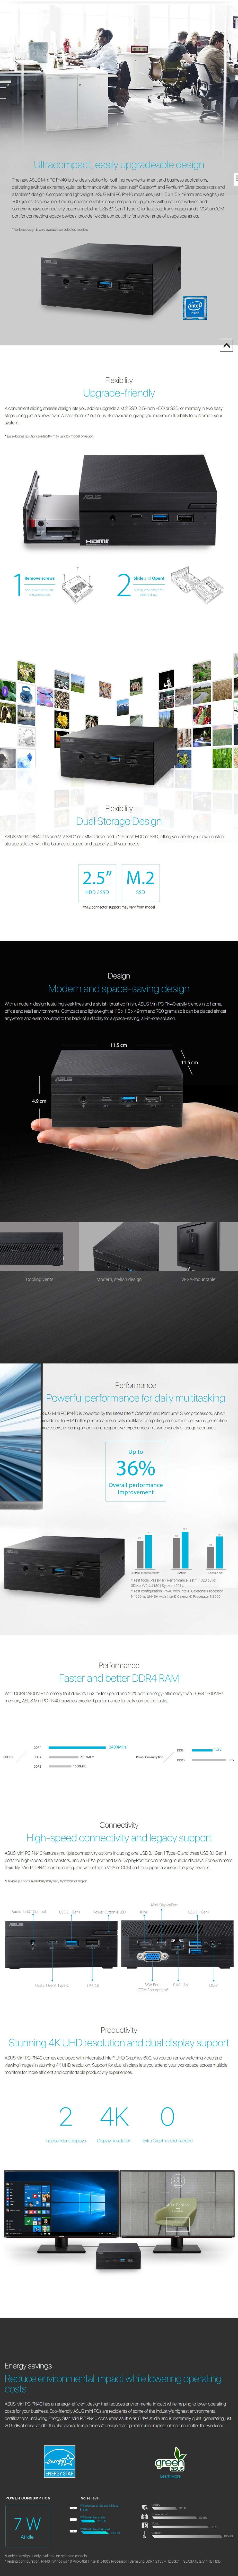 ASUS VivoMini PC PN40 Celeron J4025 4GB RAM 64GB eMMC Win10 Pro S - Overview 1